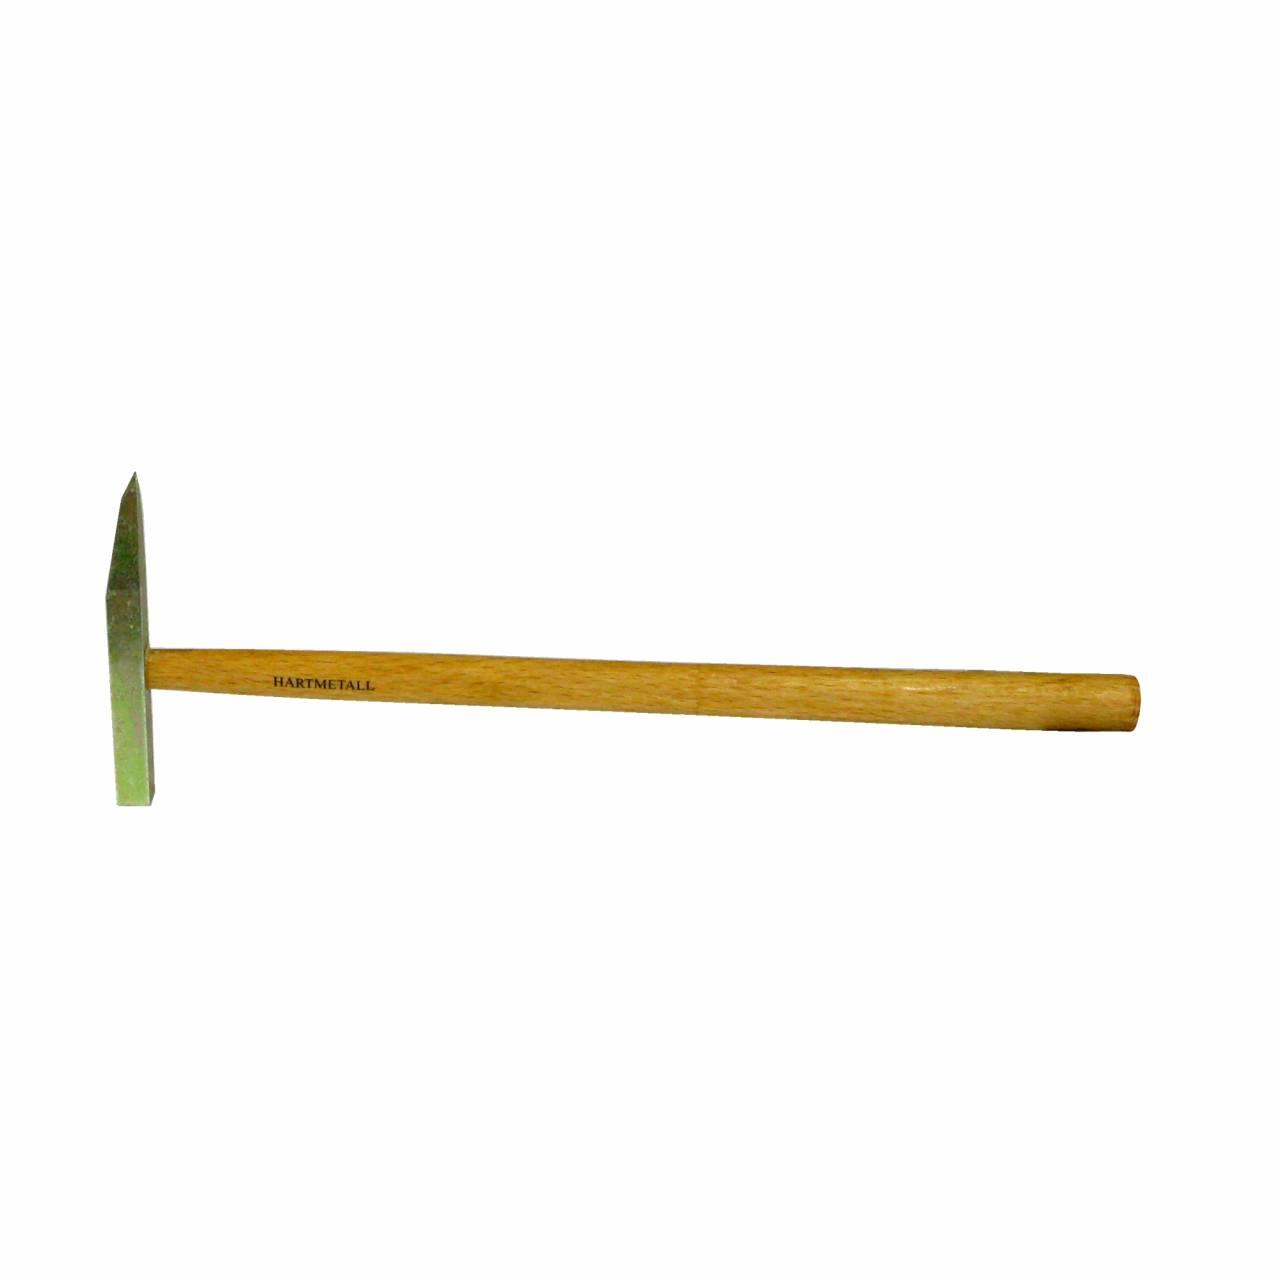 Fliesenleger-Hammer, Hartmetall, mit Holzstiel